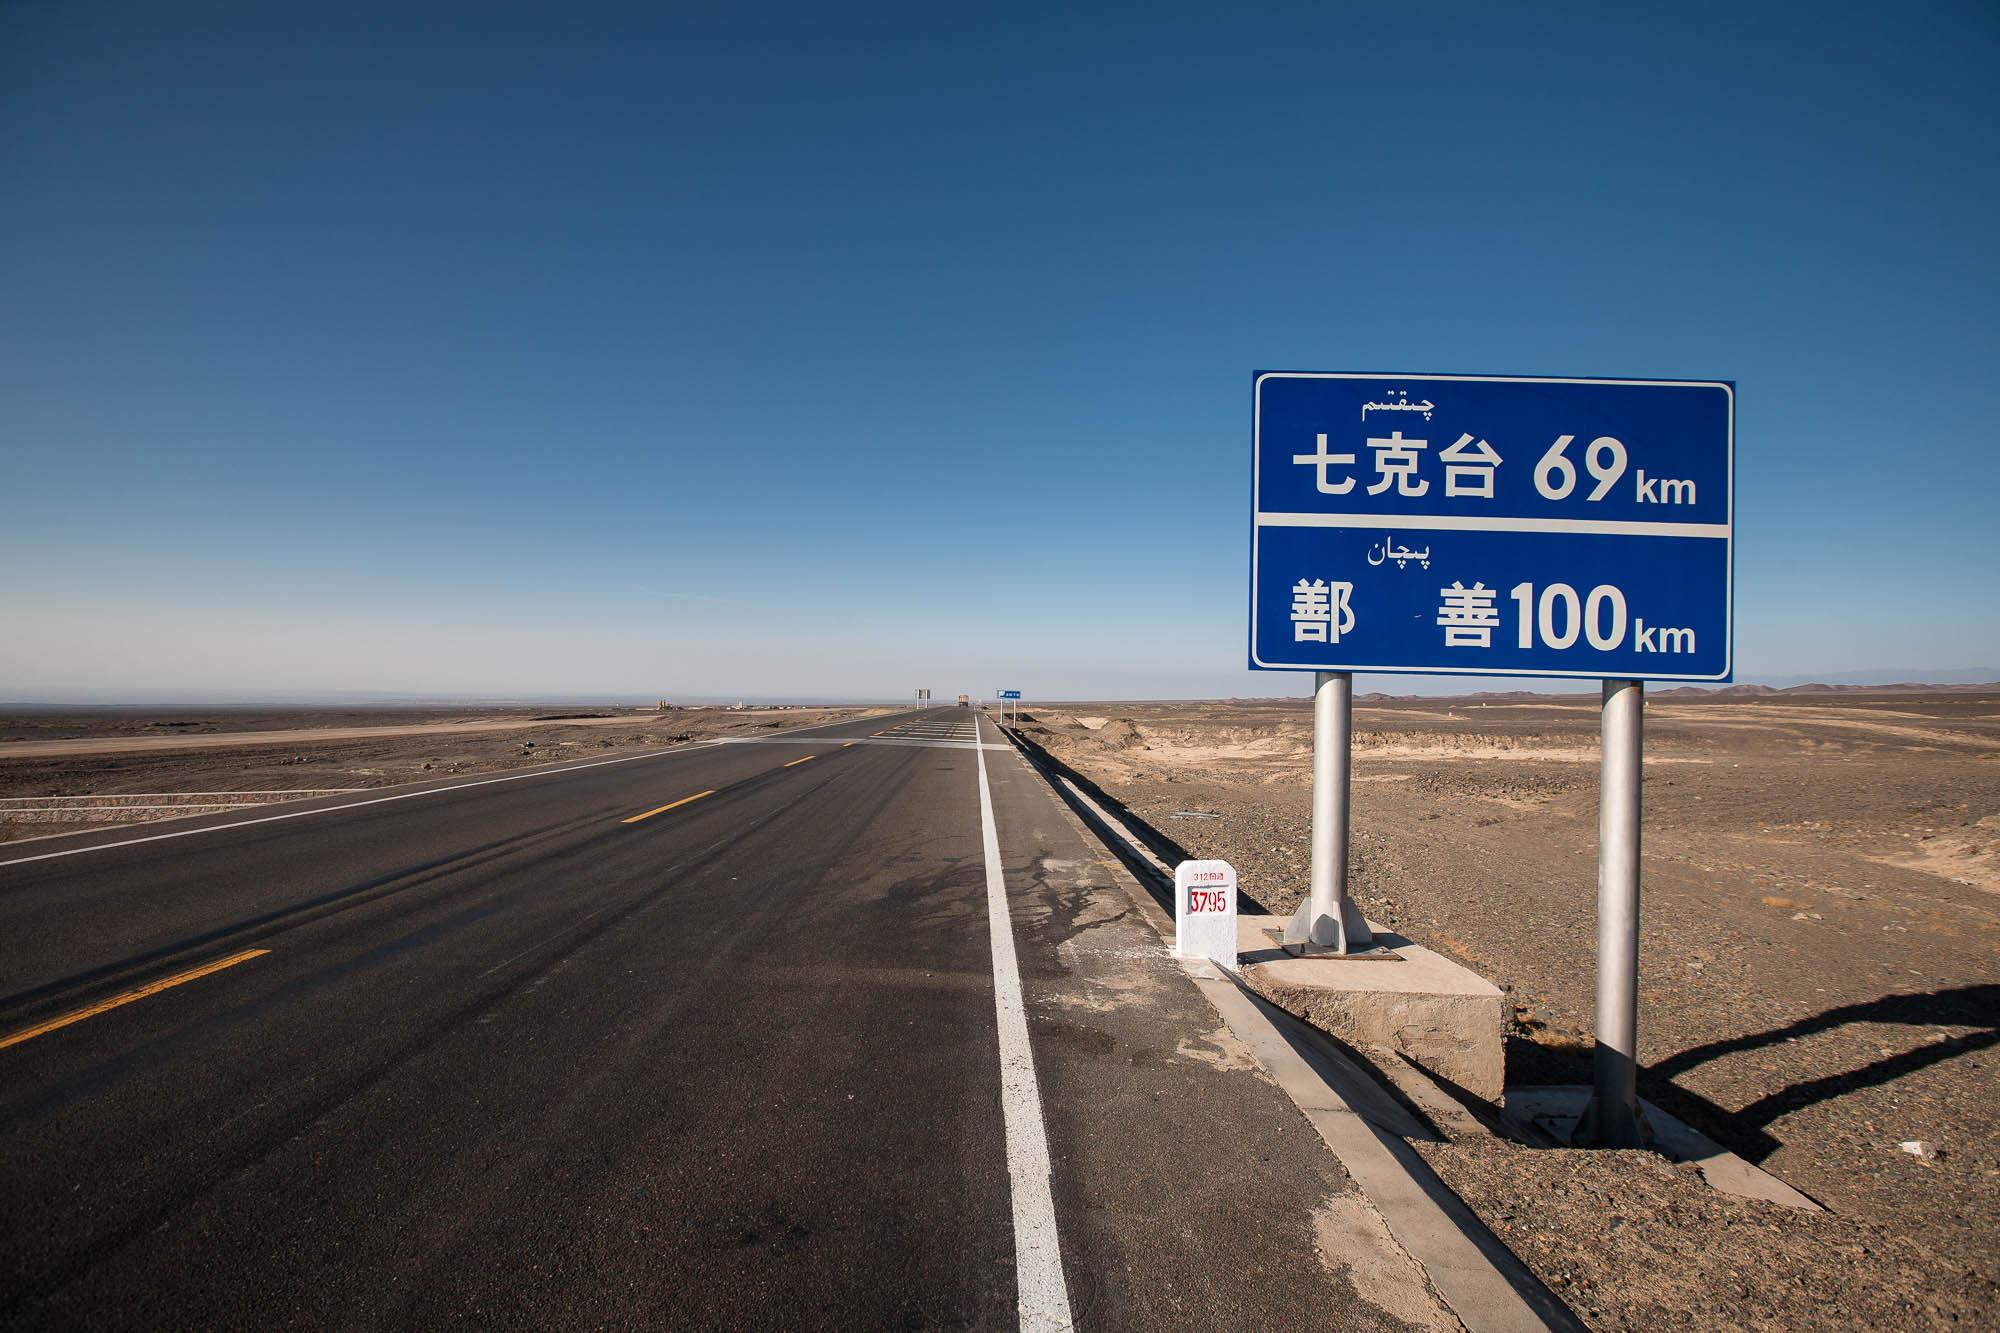 100km to Shanshan